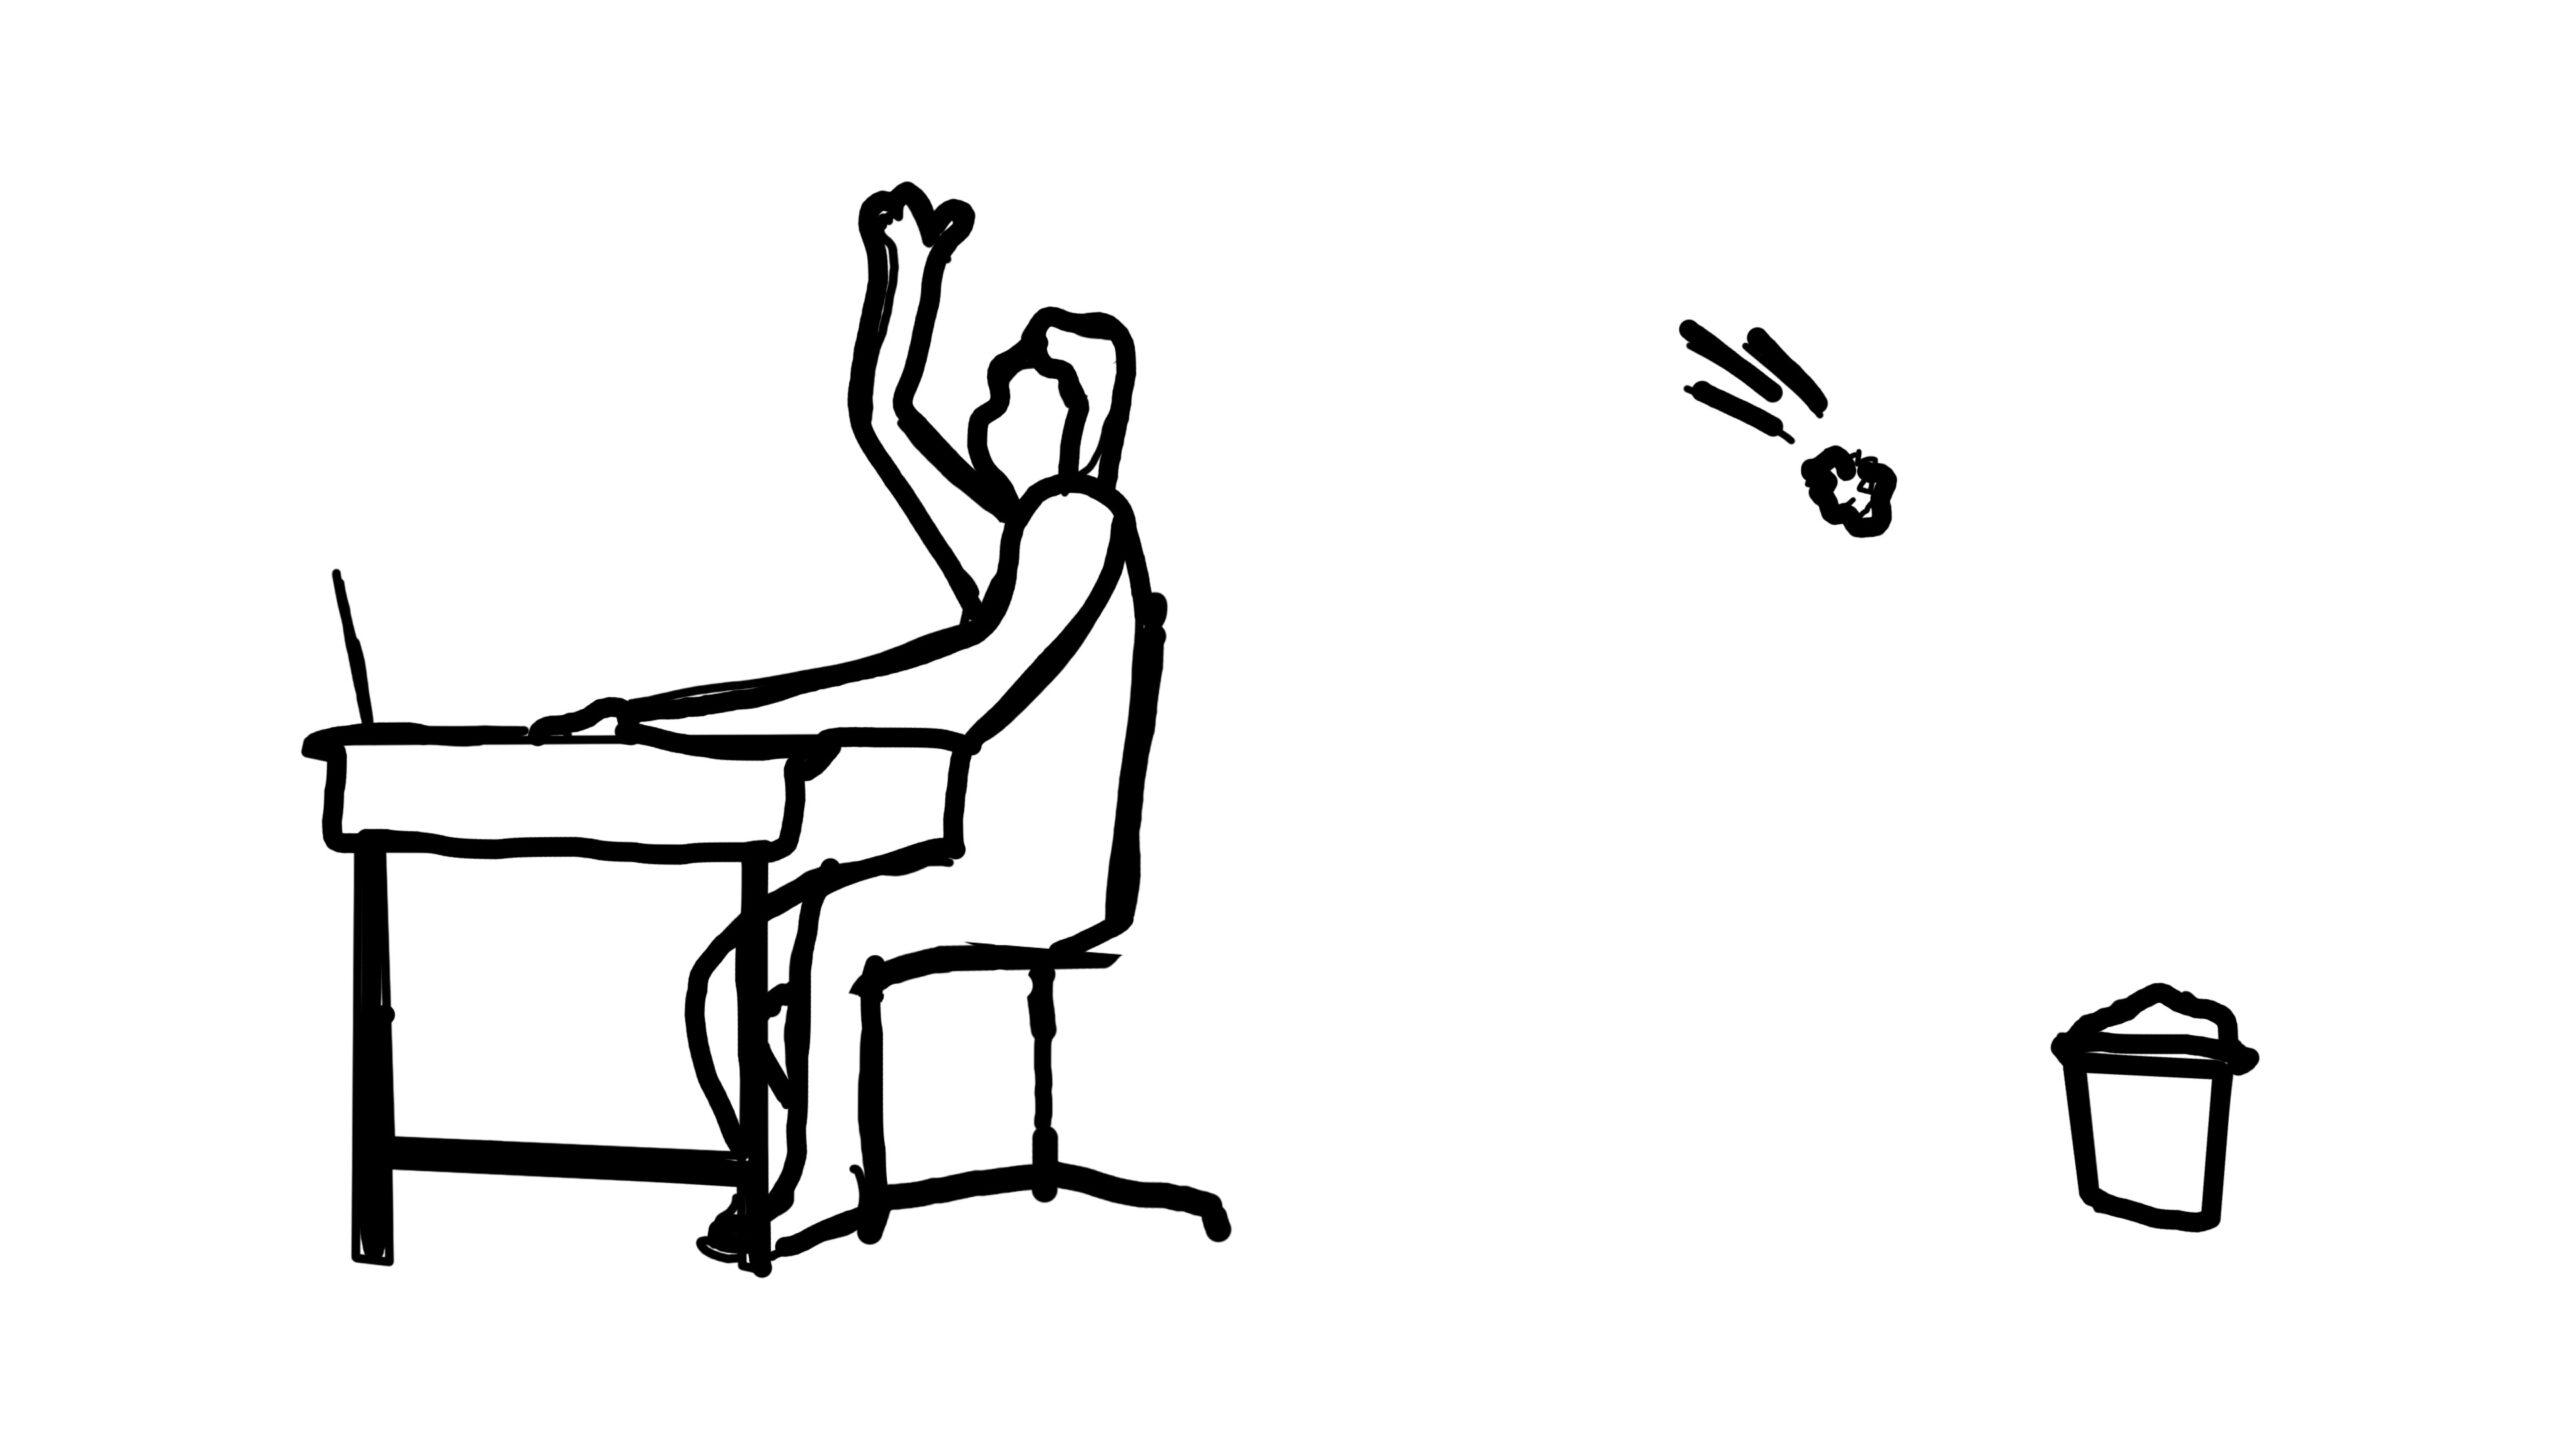 Privacy_Incident_Sketchboard_0305